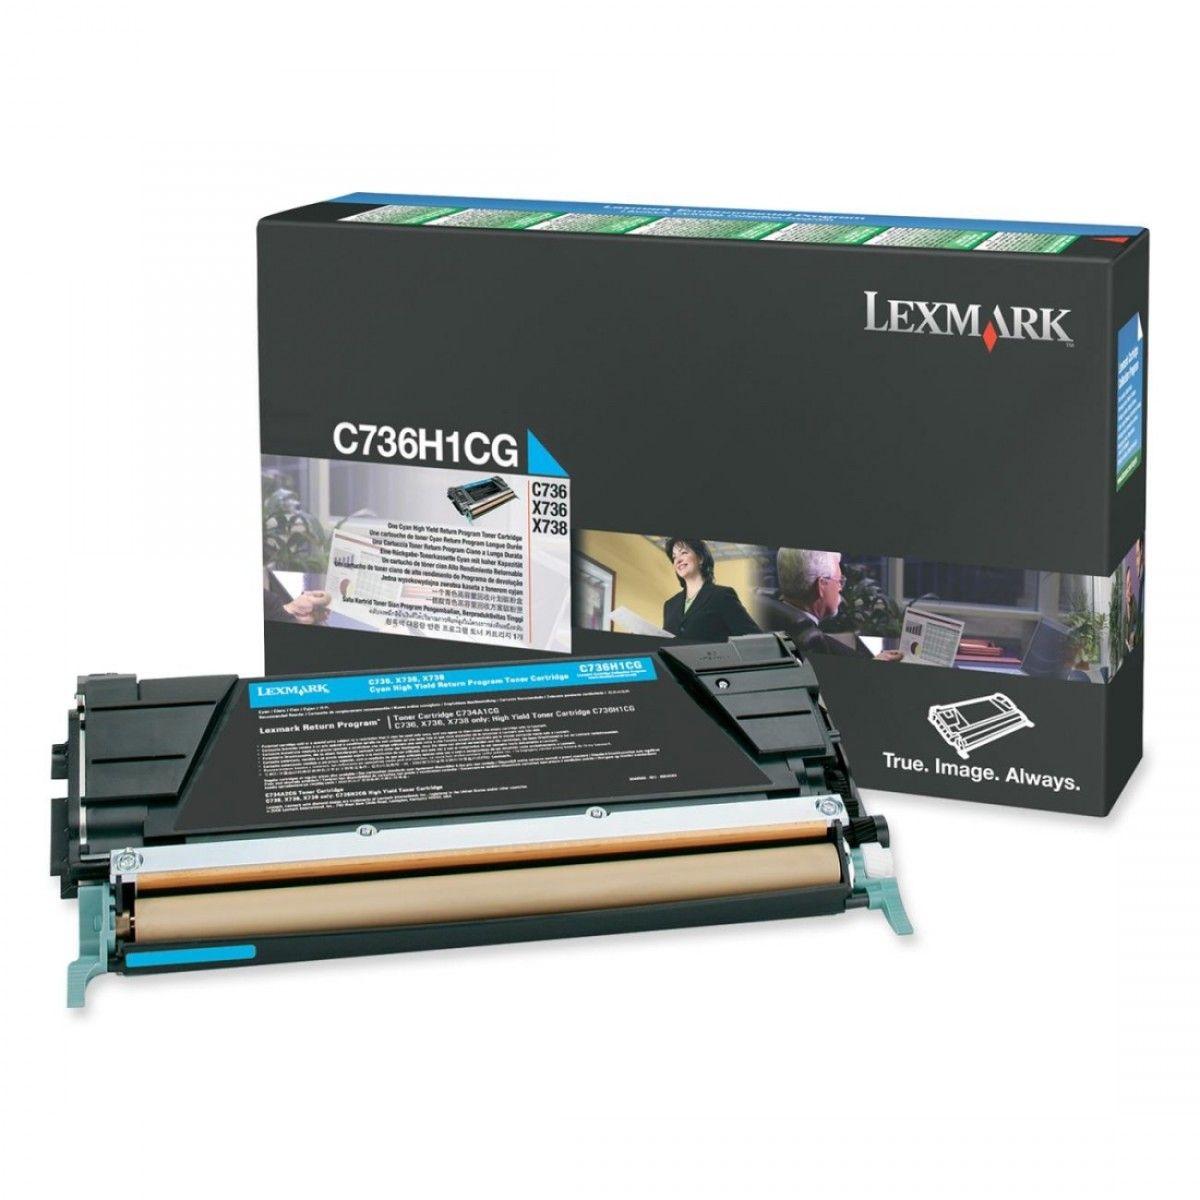 Toner Lexmark C736/X736 Ciano - C736H1CG